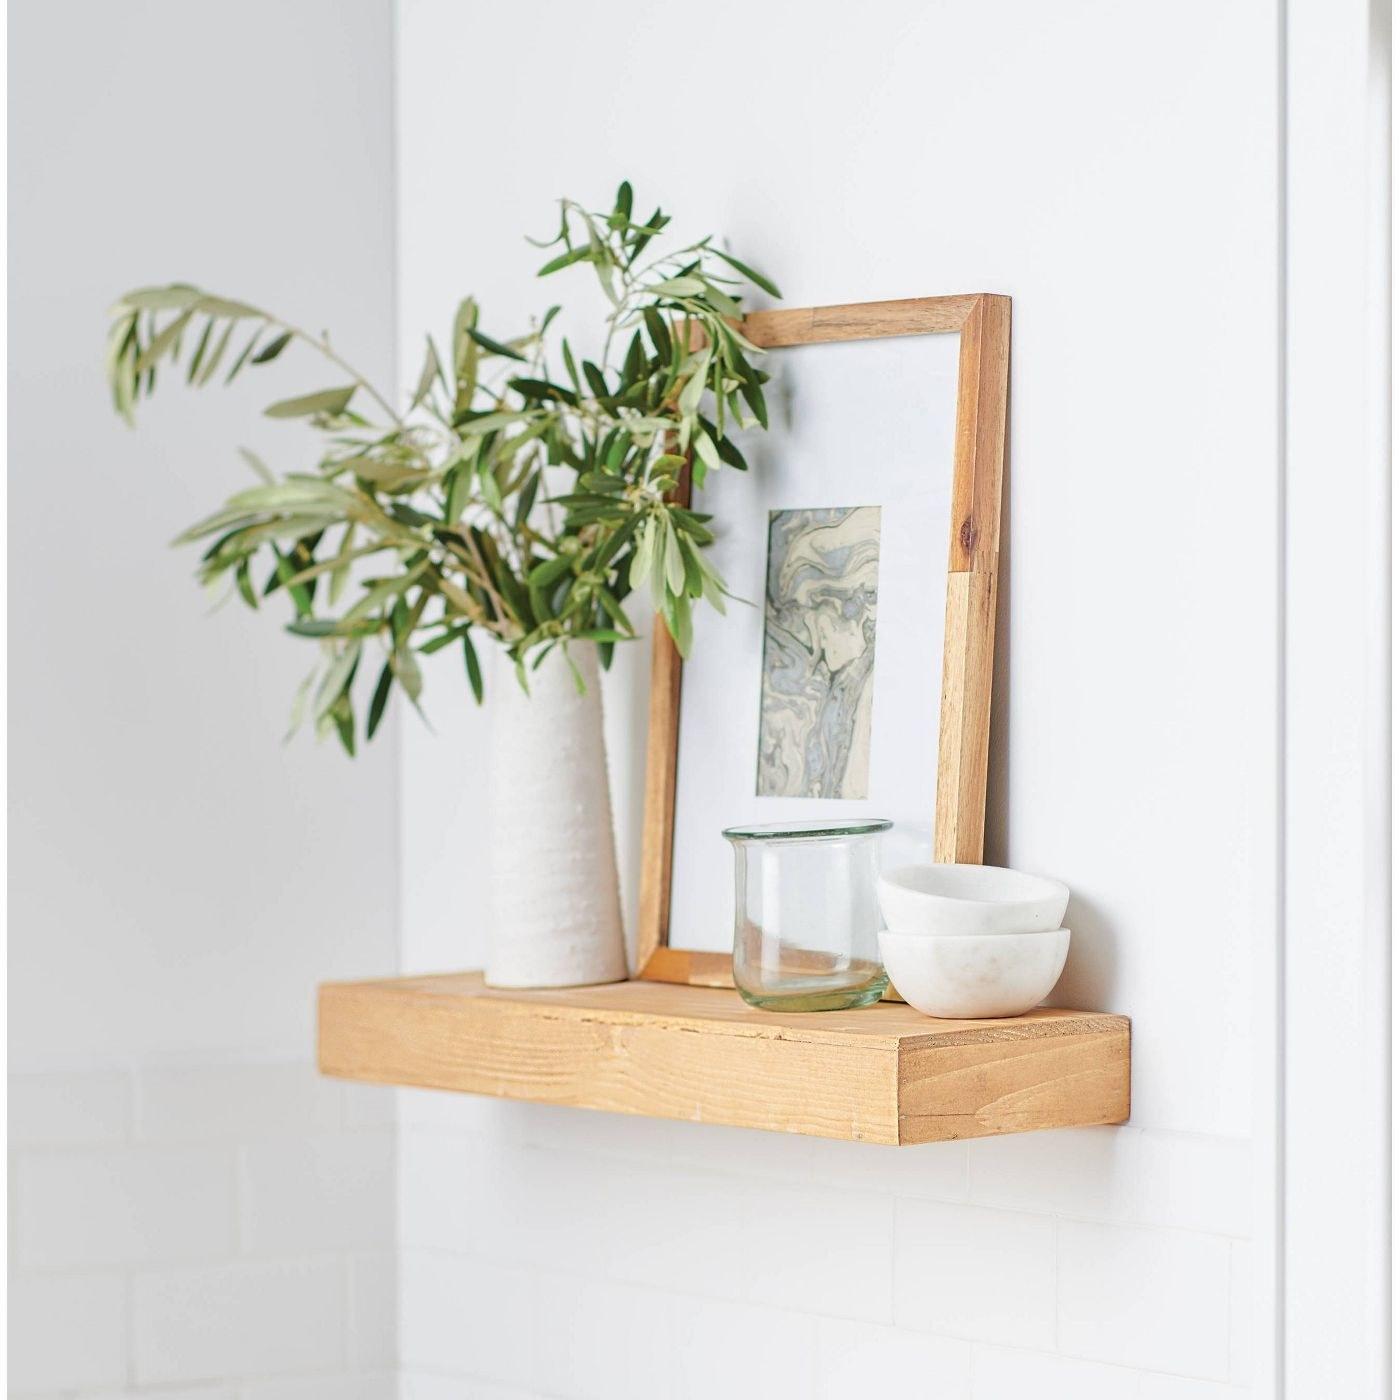 Thefloating wood pine wall shelf